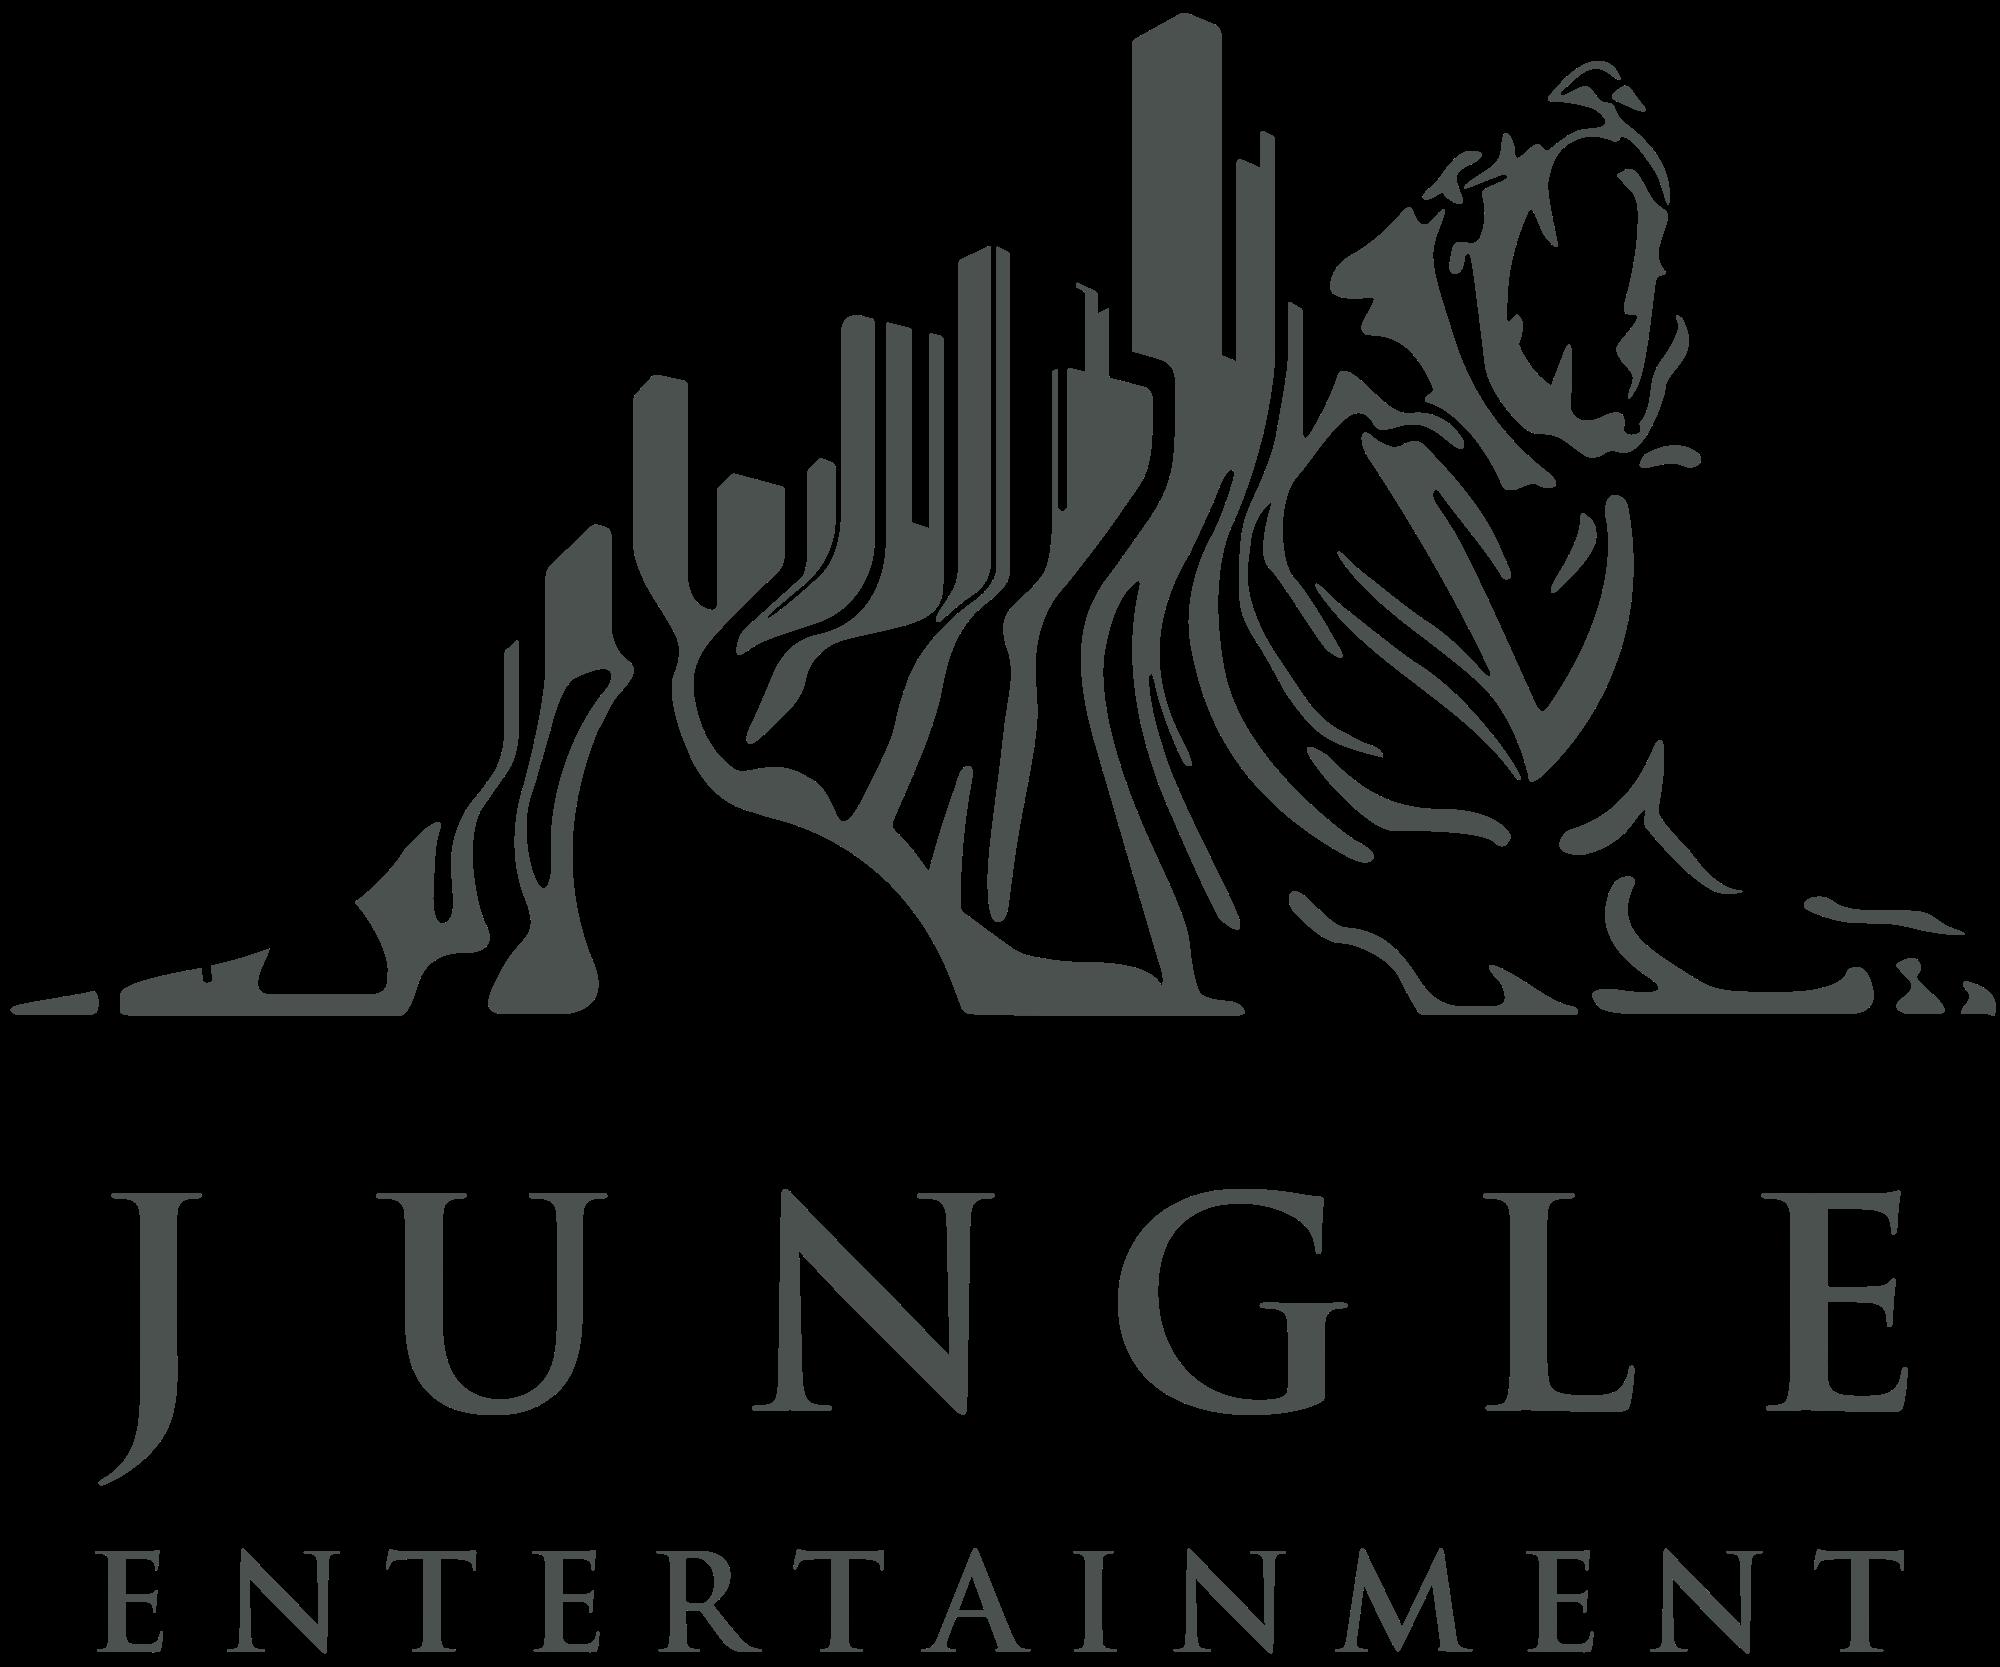 Jungle Entertainment